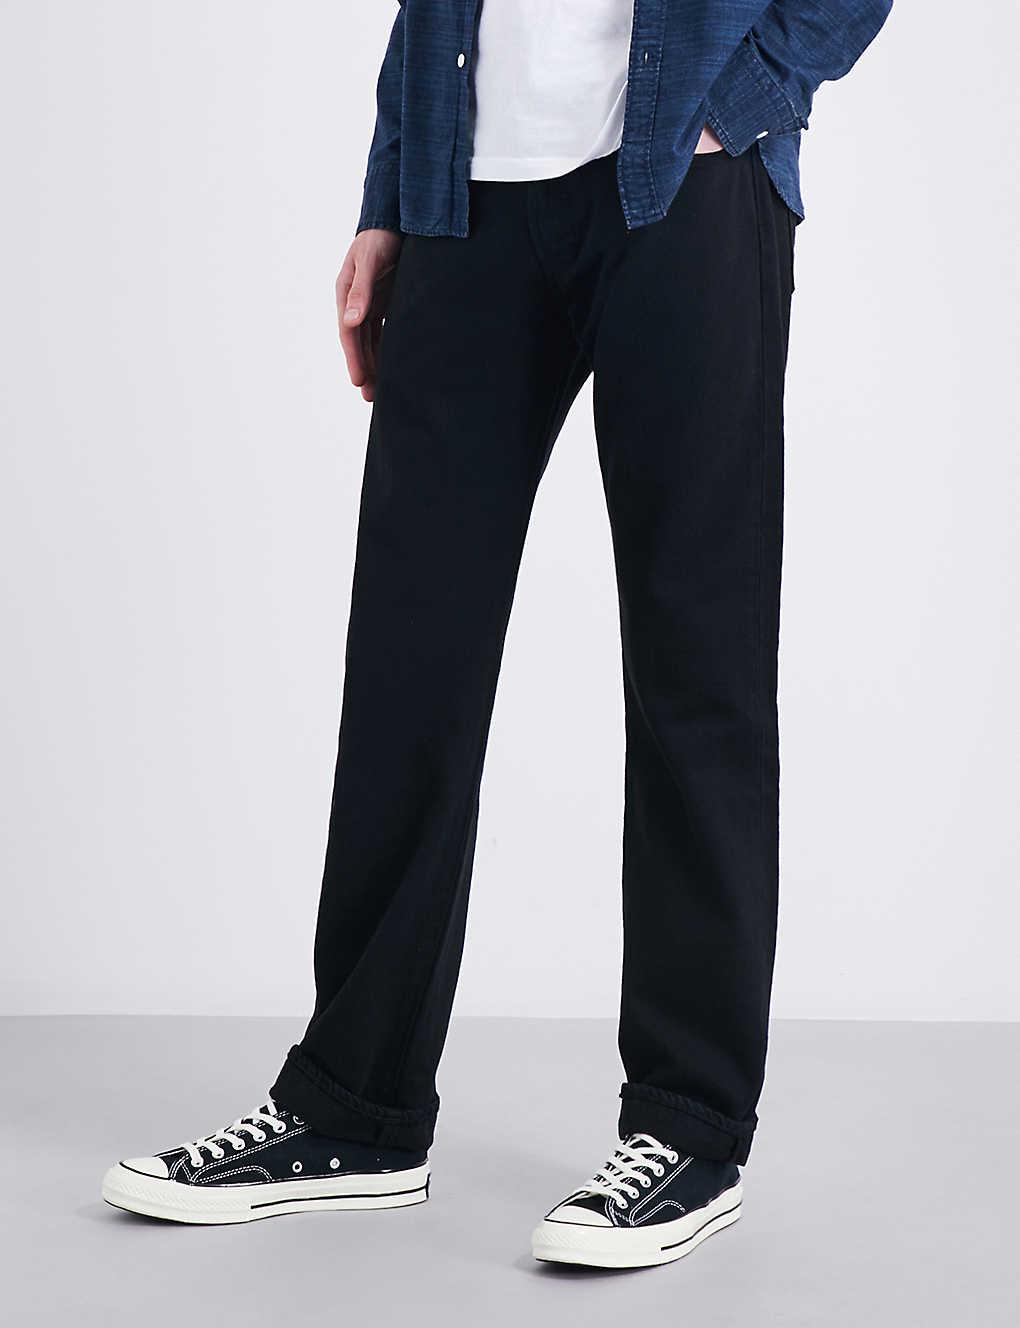 6a58a3ba LEVI'S - 501 Original regular-fit straight jeans | Selfridges.com